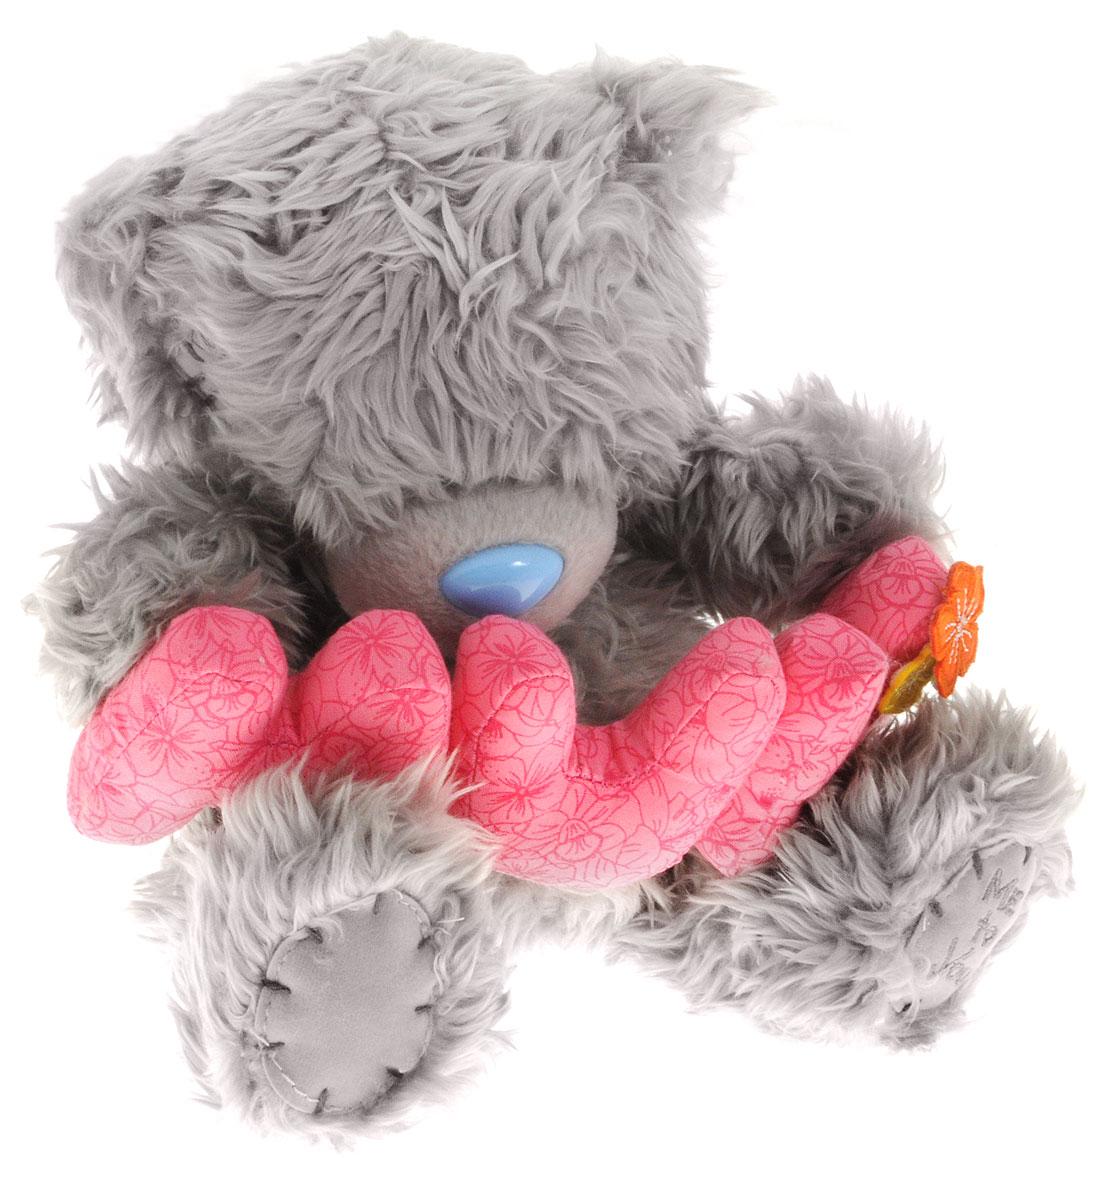 Me to You Мягкая игрушка Мишка Тедди 20 см